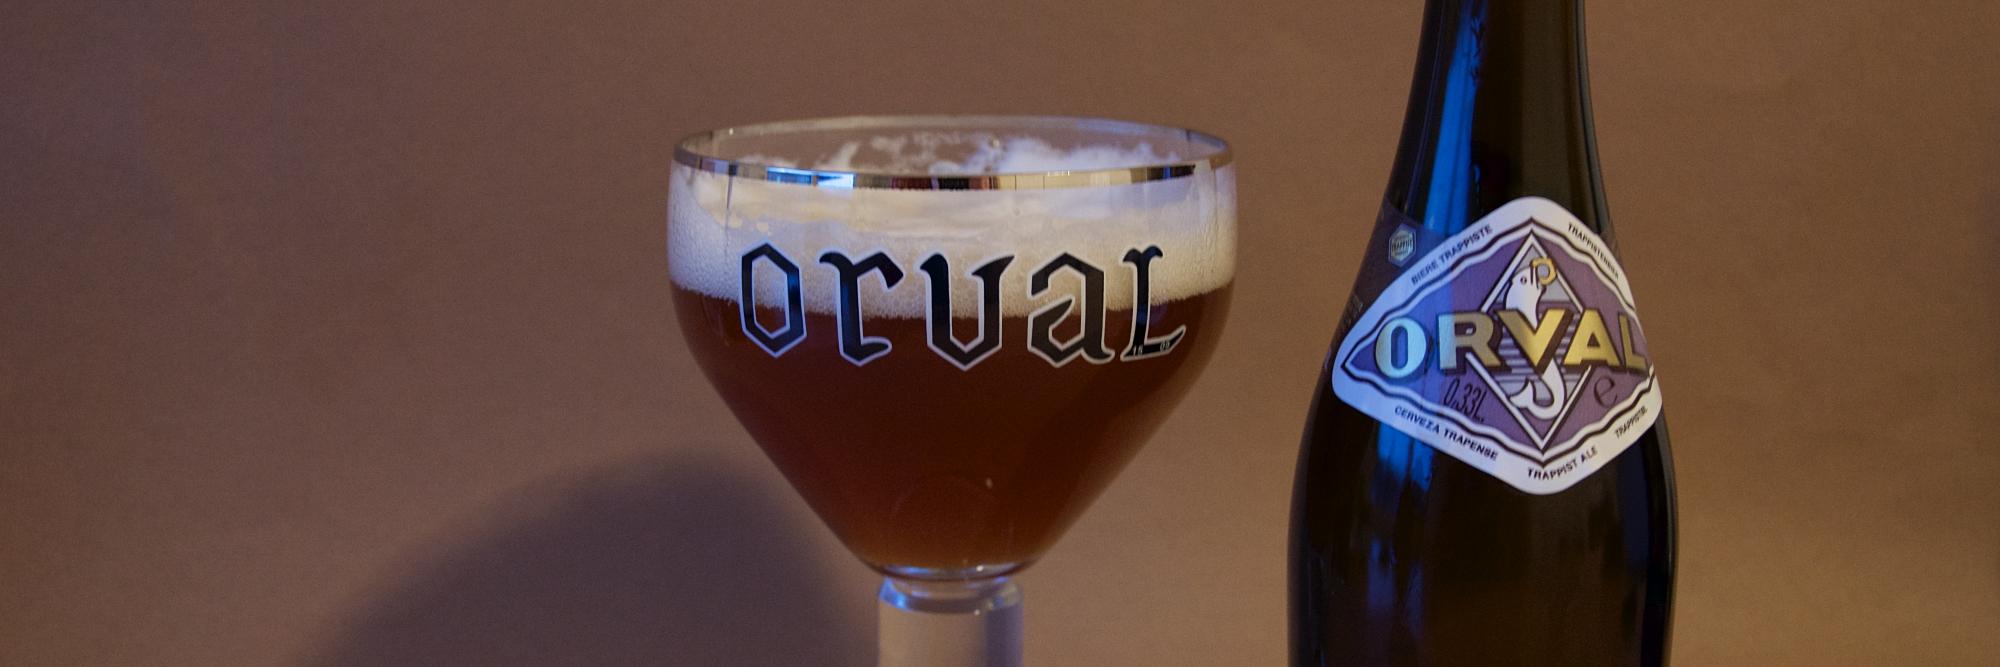 Trappistenbier Orval